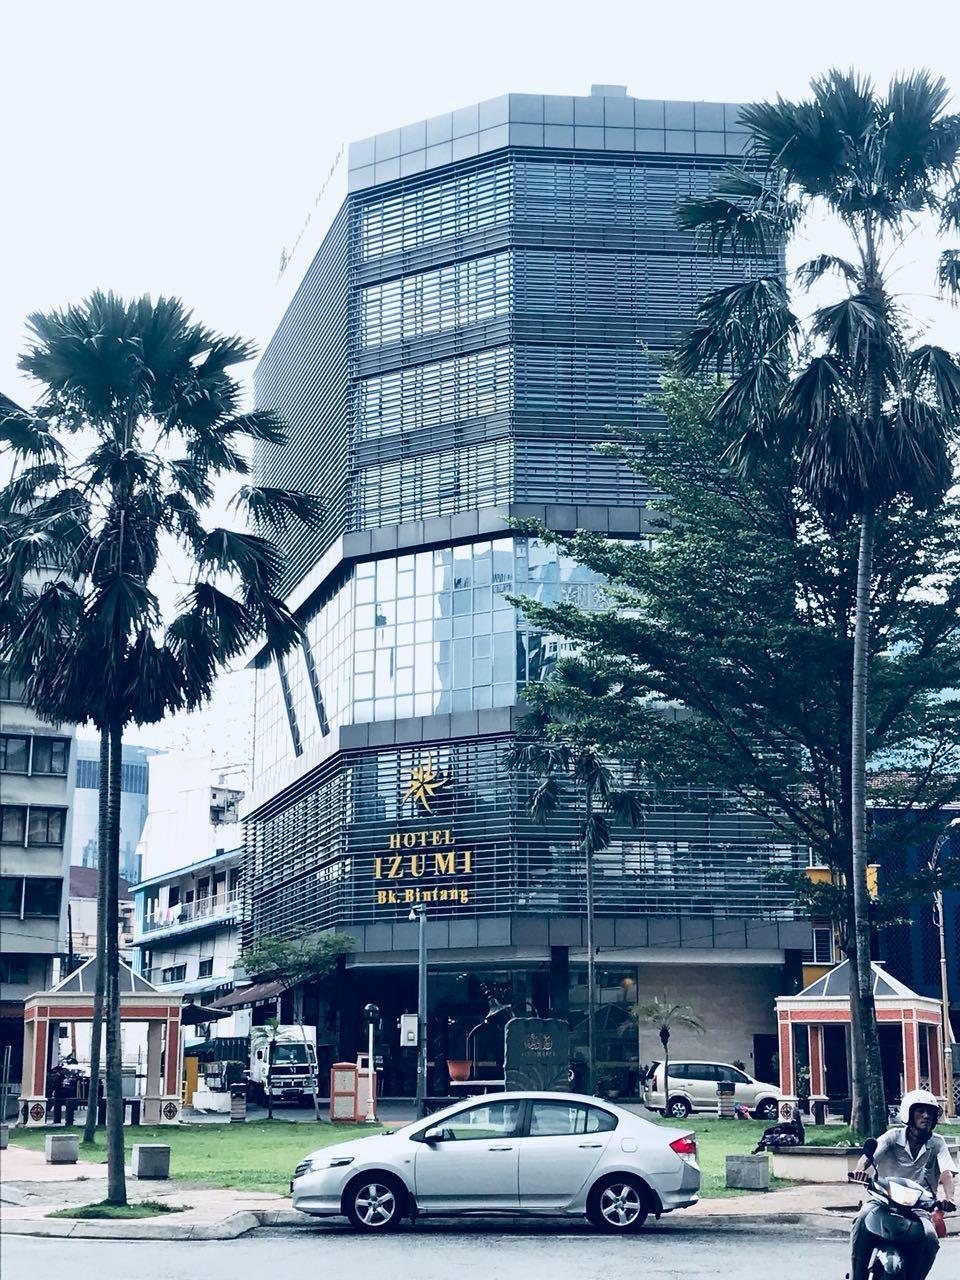 Photo of Izumi Hotel, Jalan Berangan, Bukit Bintang, Kuala Lumpur, Federal Territory of Kuala Lumpur, Malaysia by Swati Singh